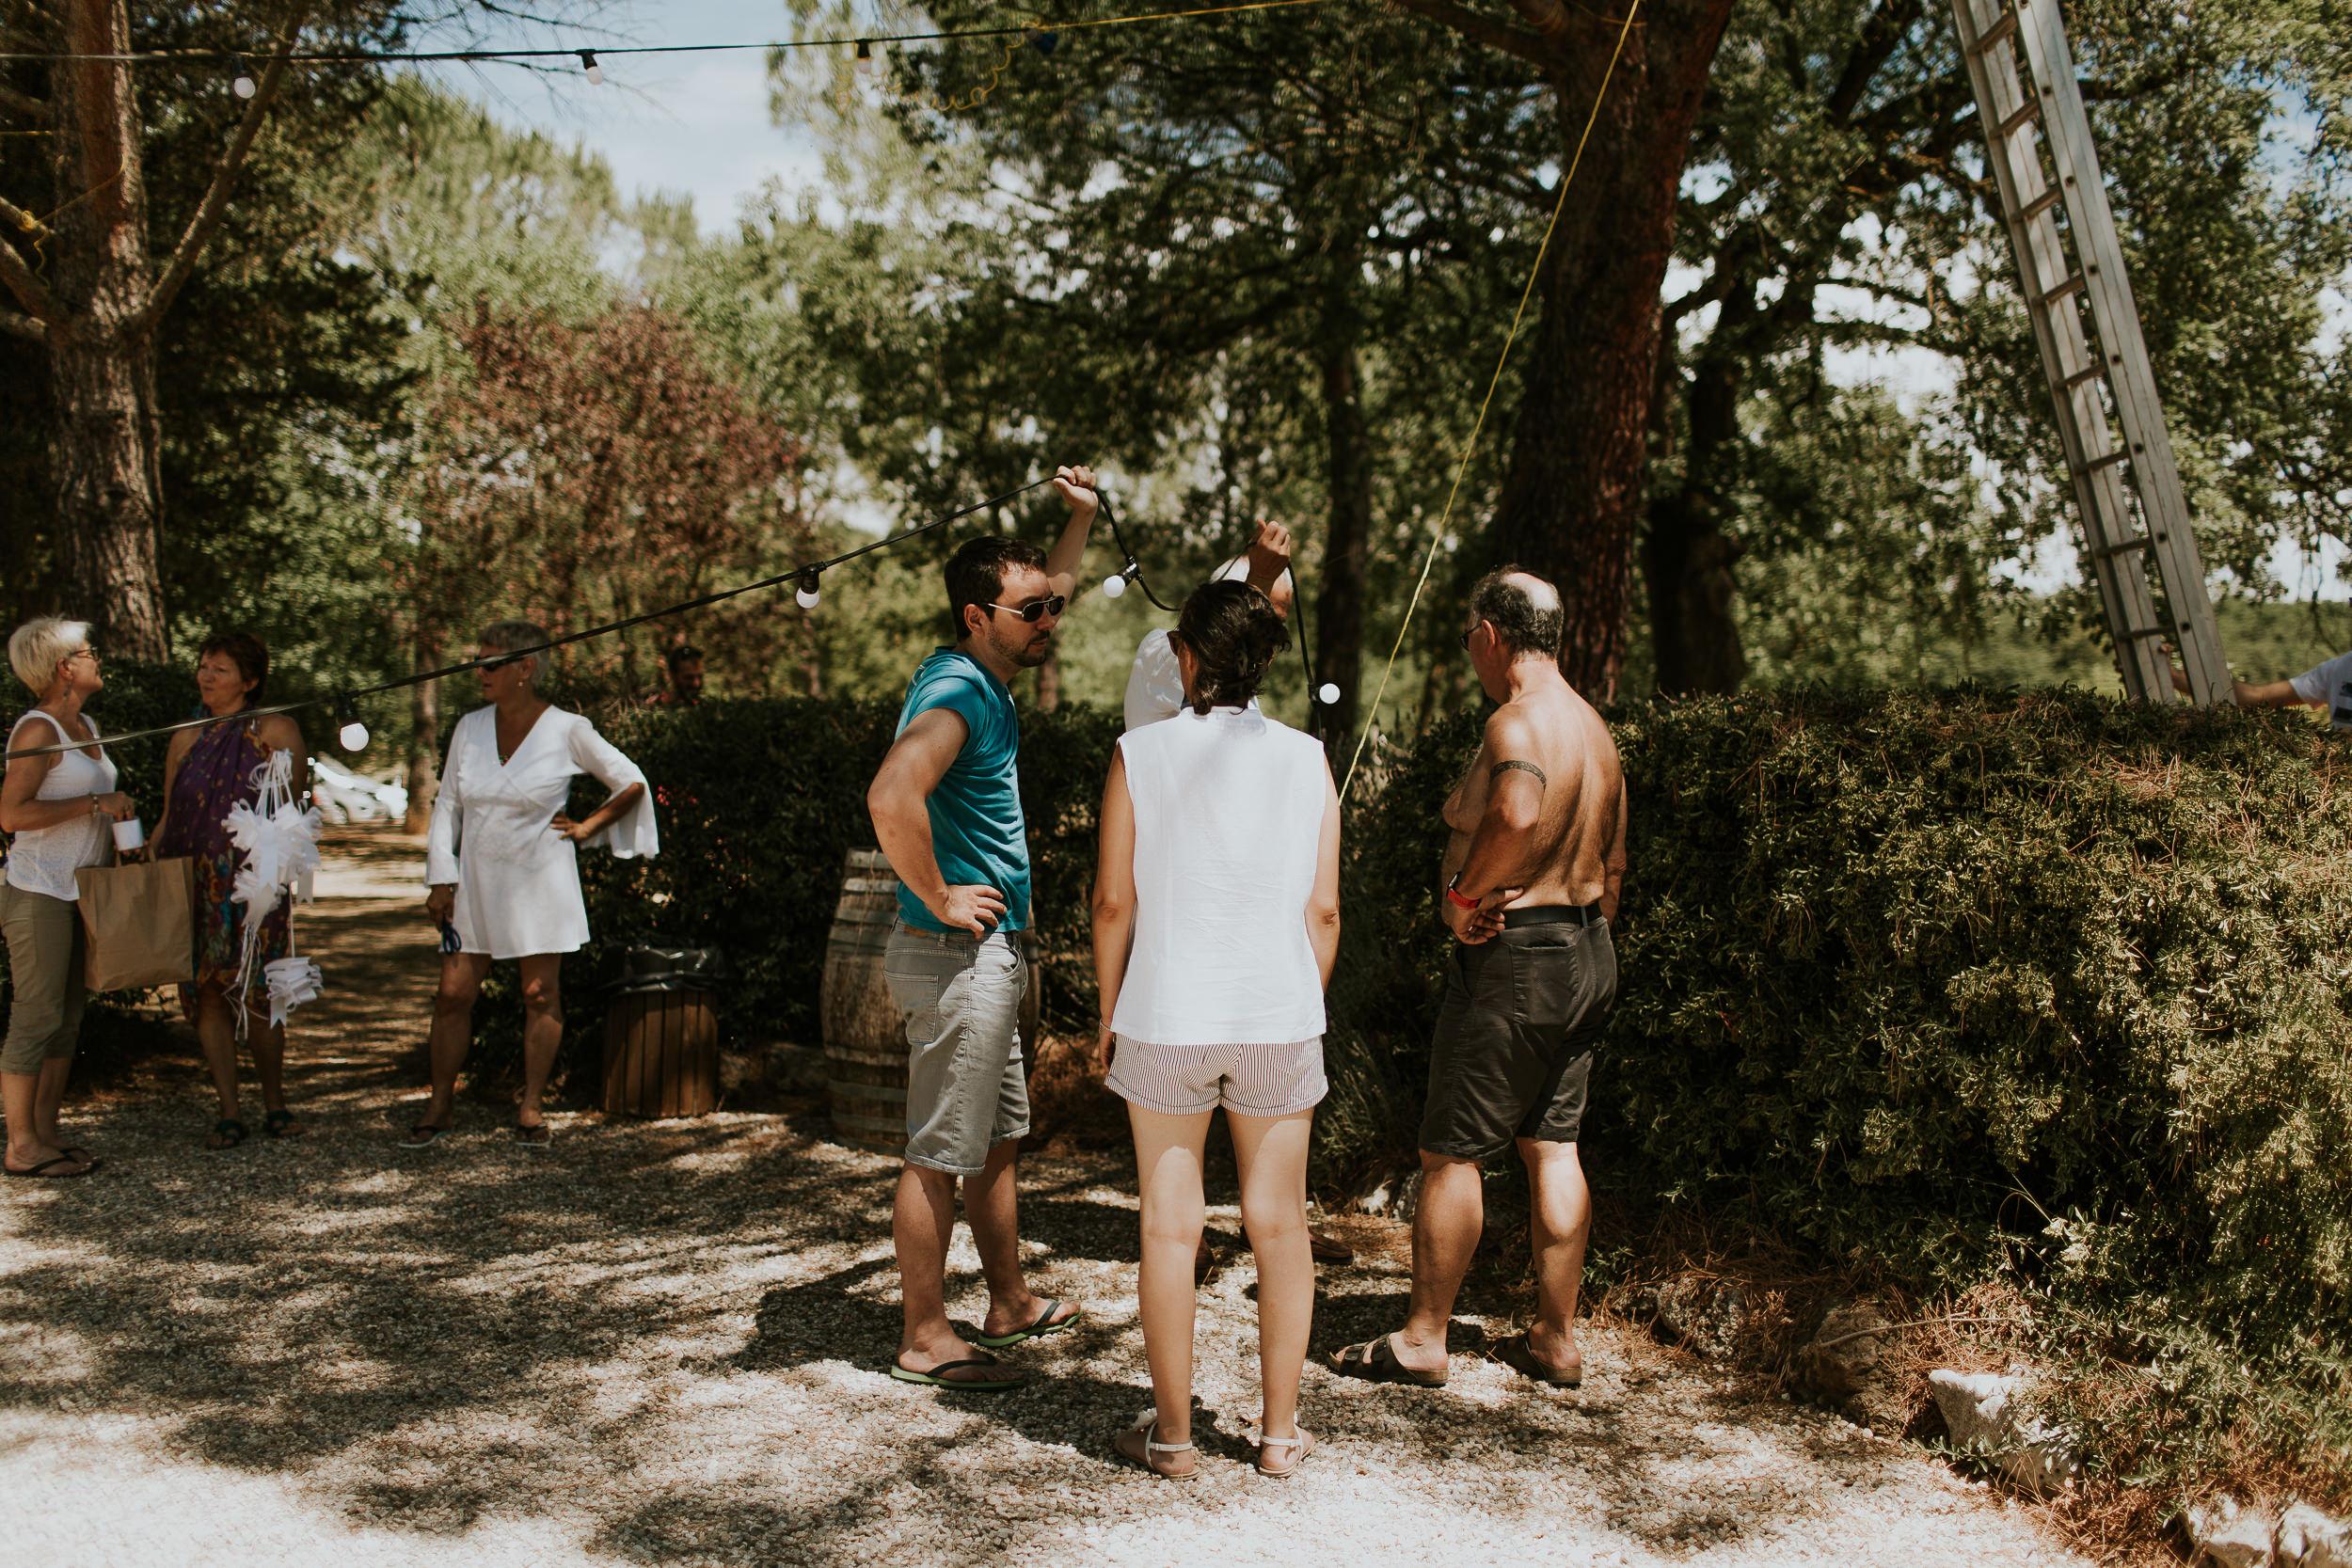 davidmaire_delphinepa_toscane_destinationwedding-5.jpg